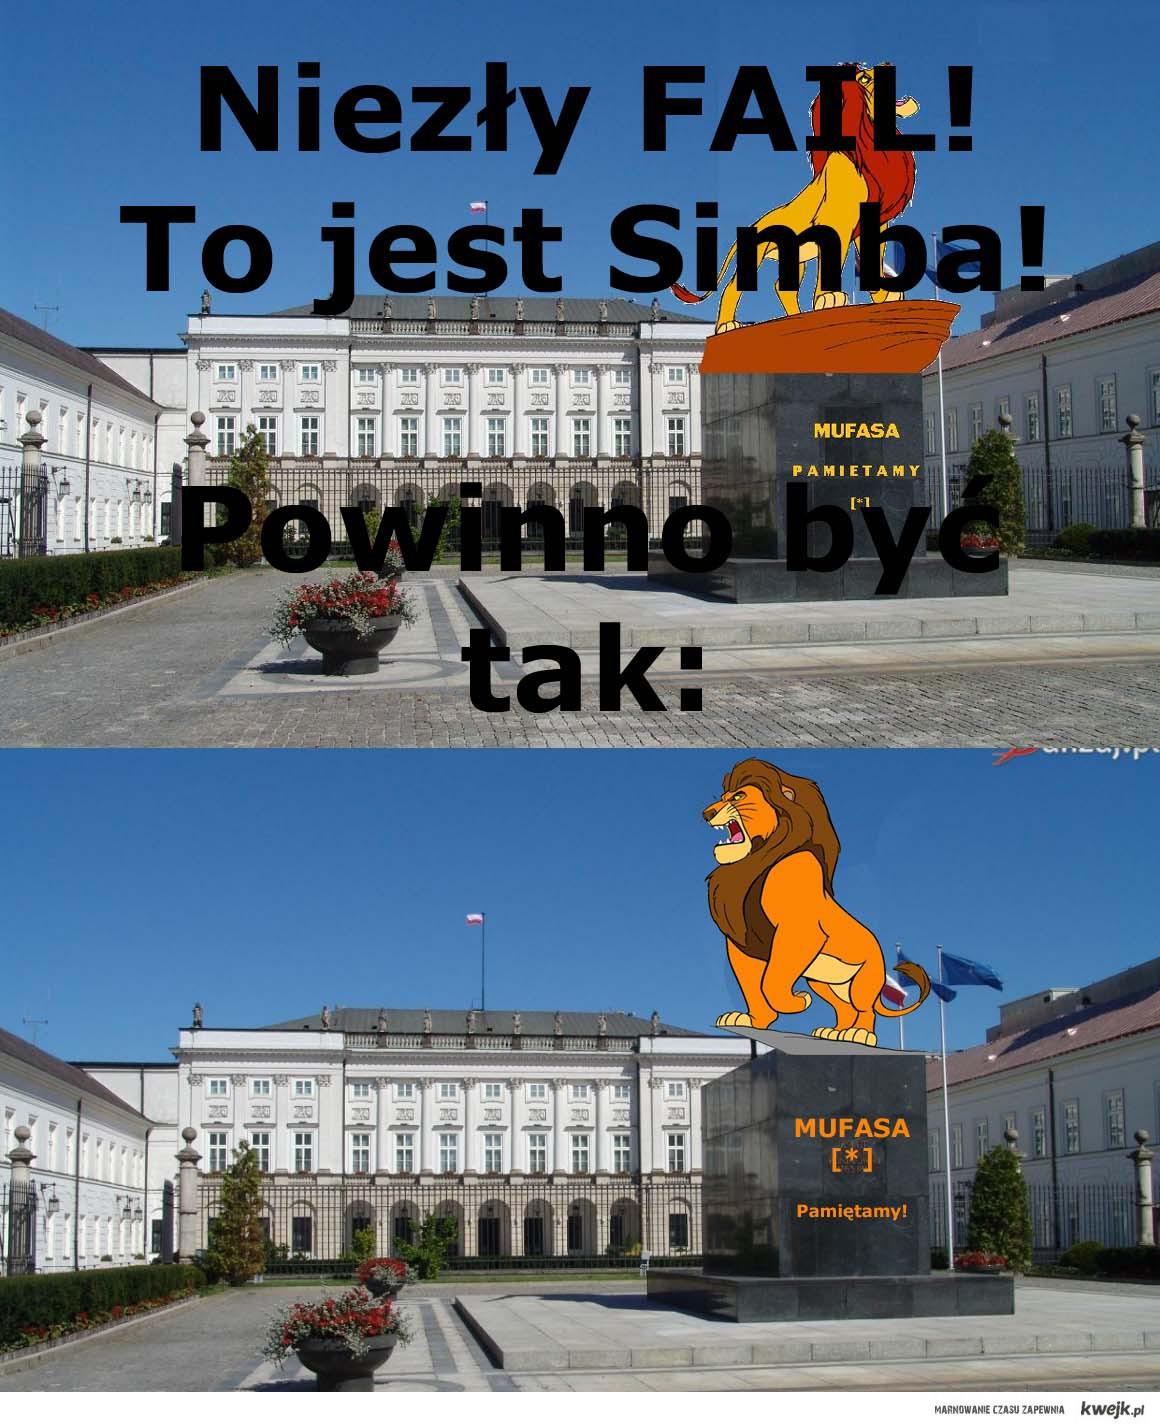 Simba fail